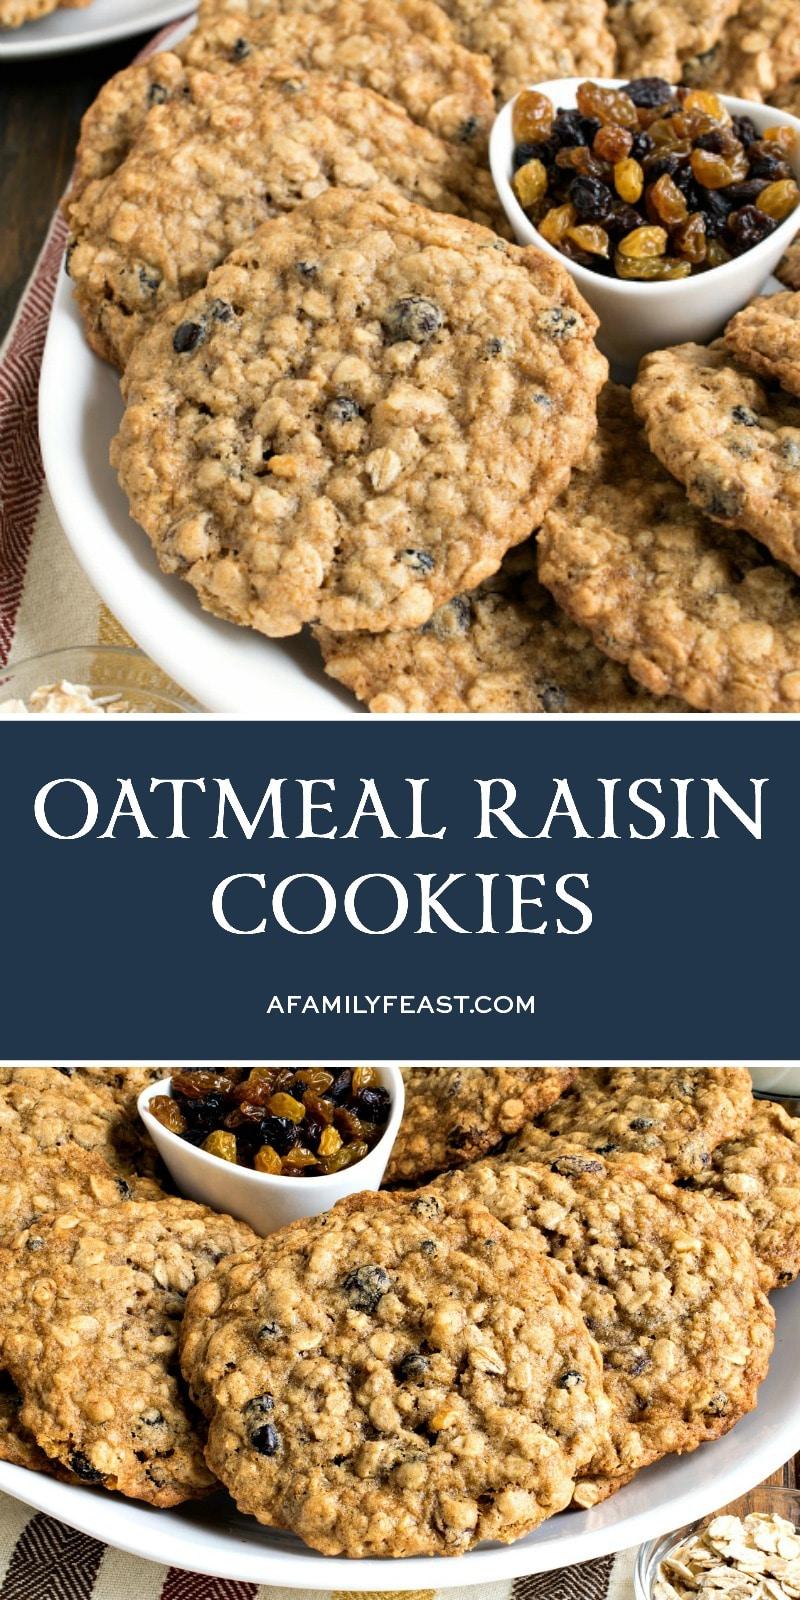 Oatmeal Raisin Cookies - A Family Feast